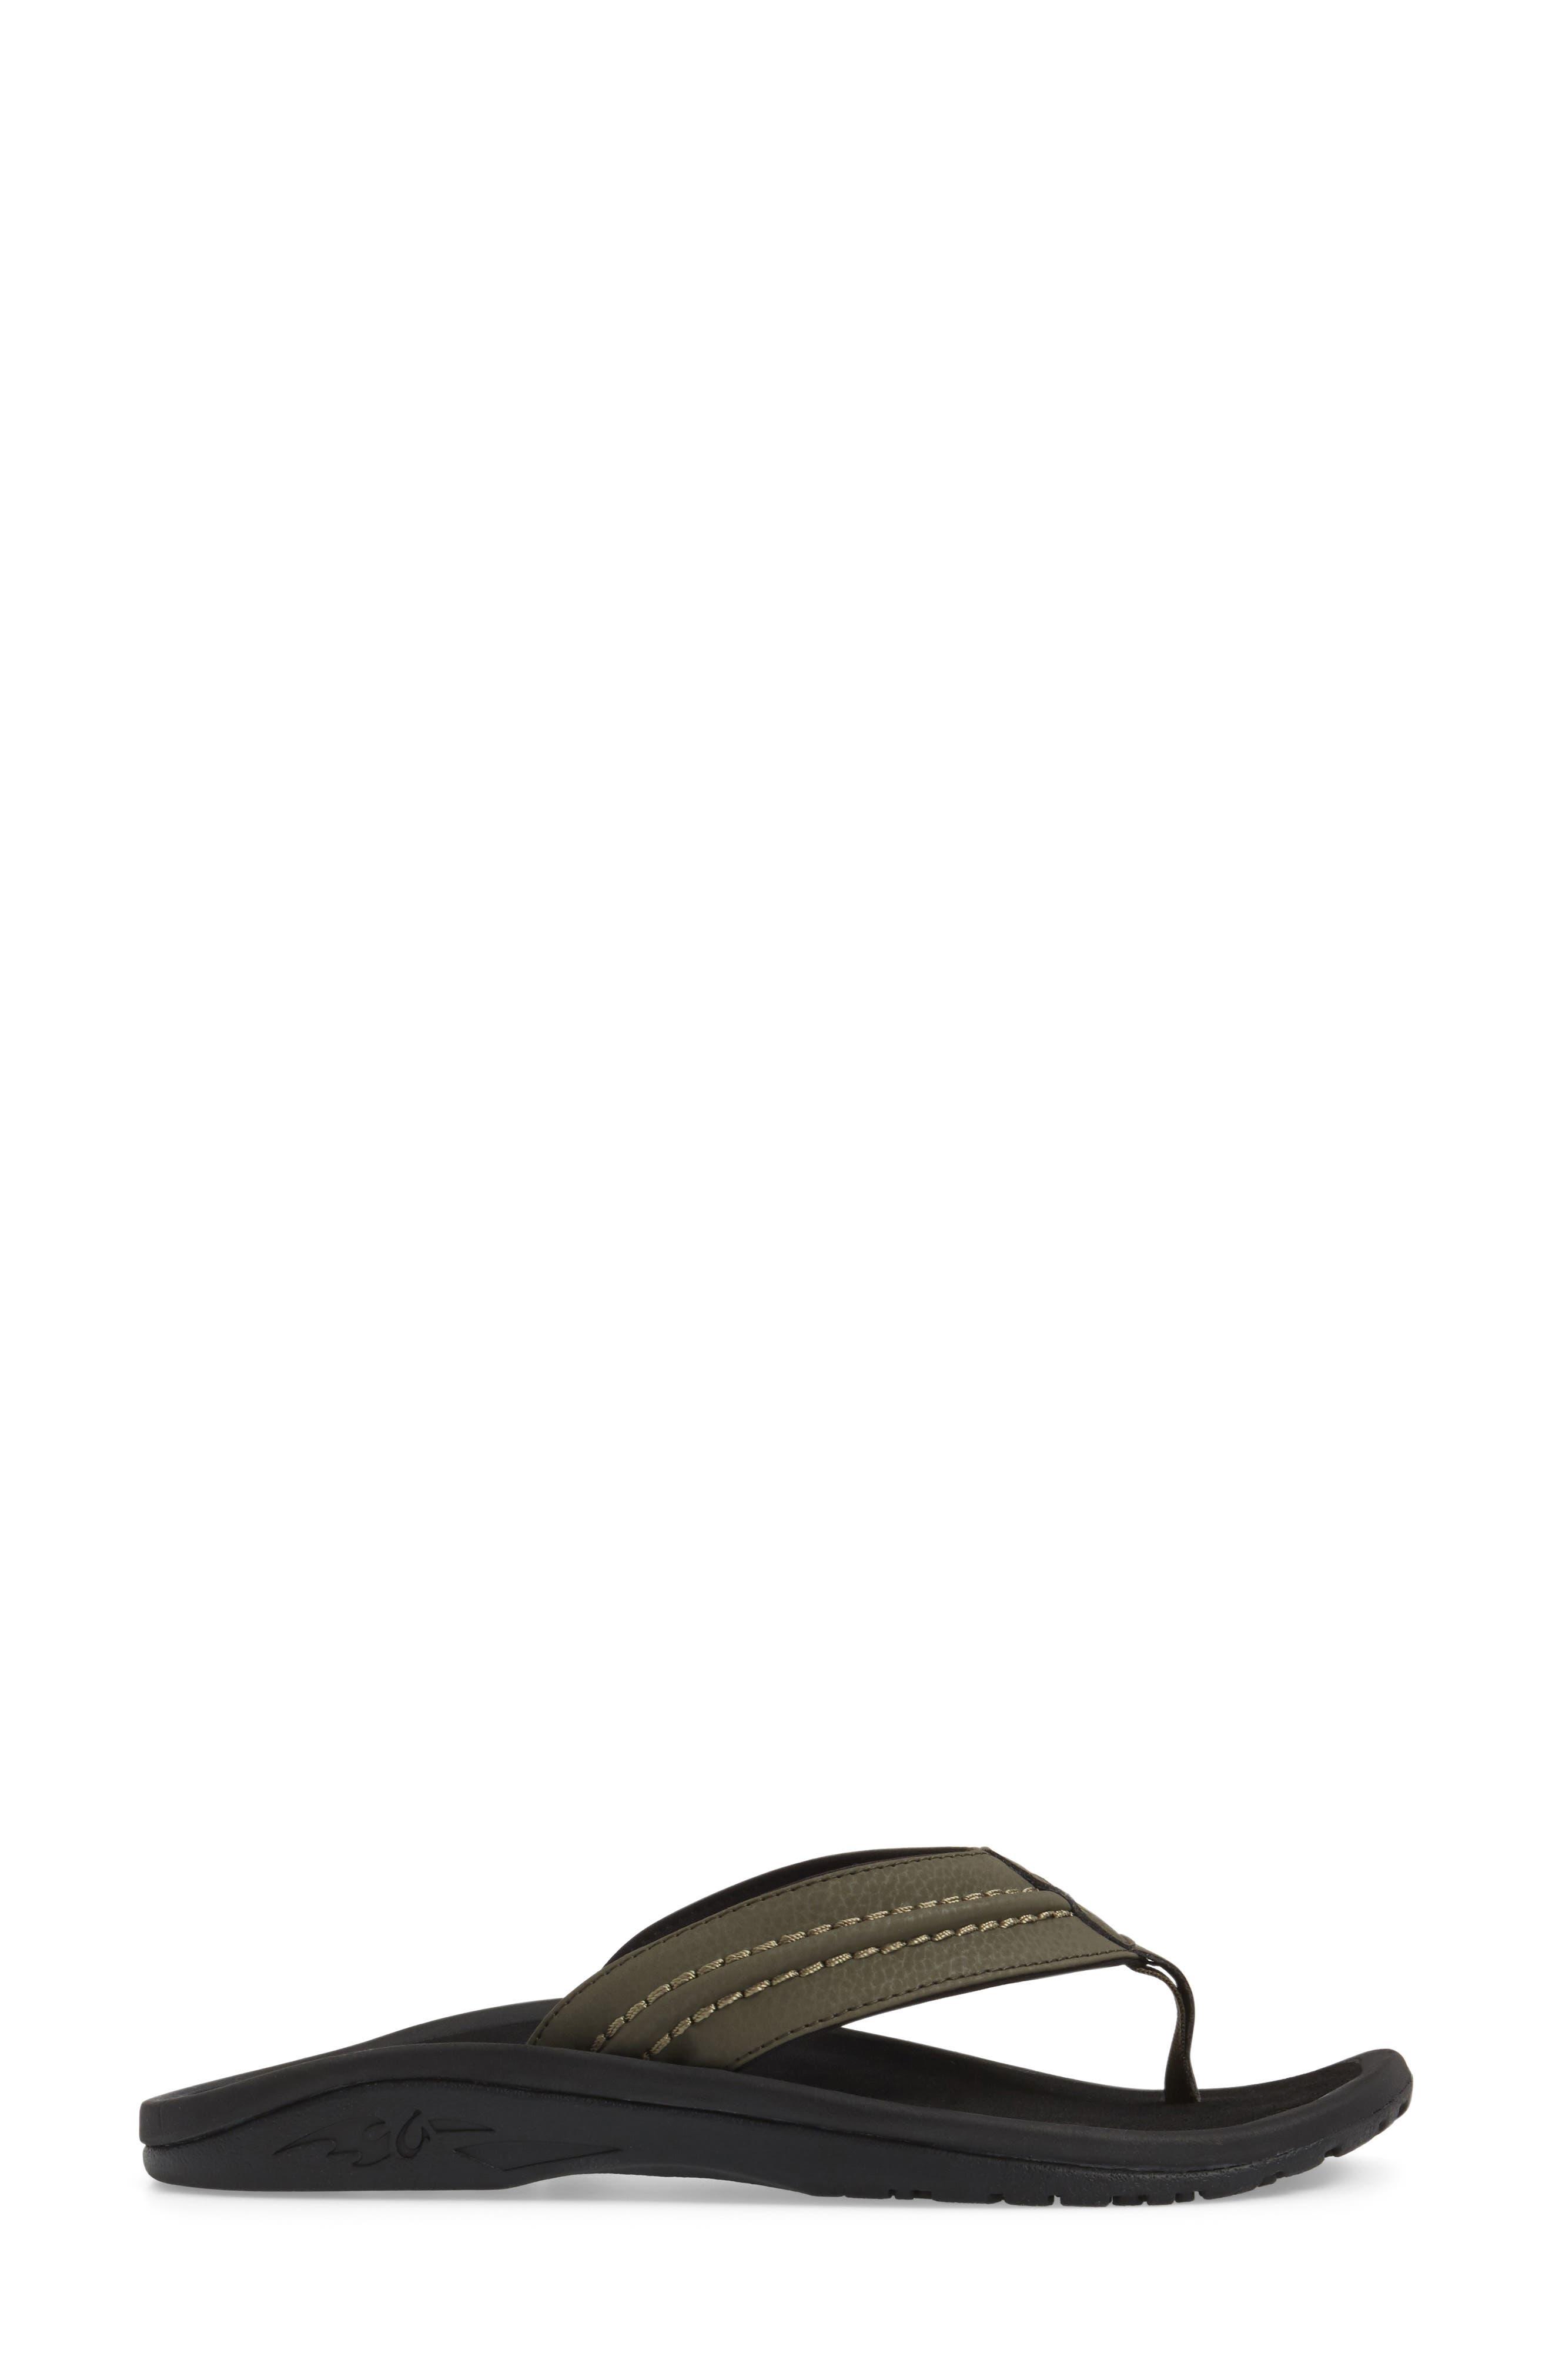 Hokua Flip Flop,                             Alternate thumbnail 31, color,